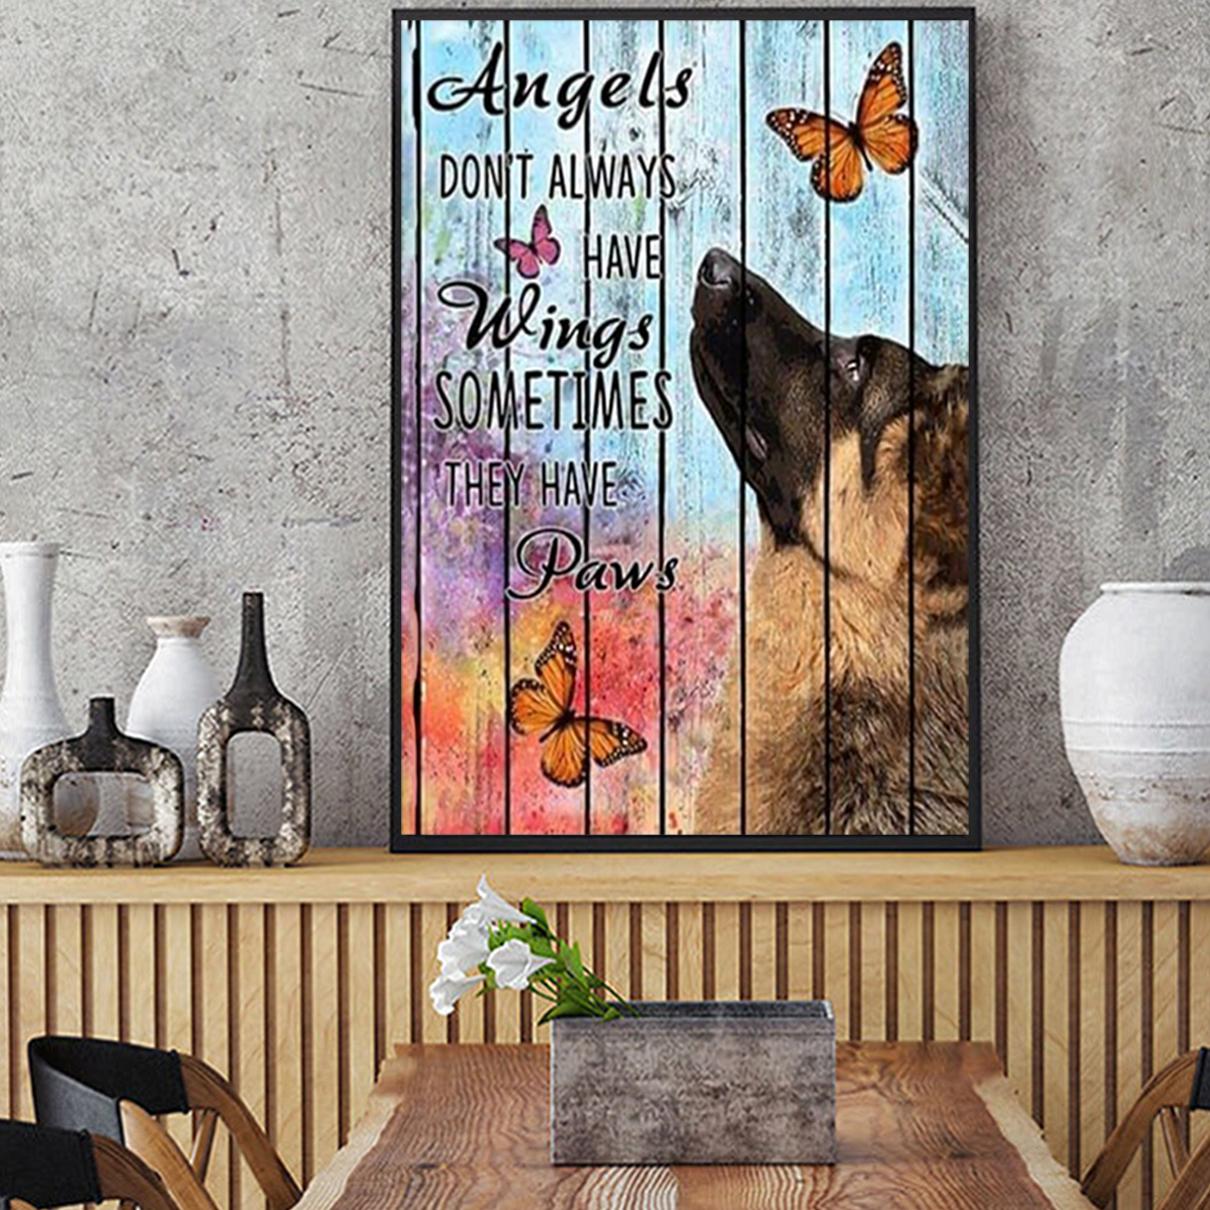 German shepherd angels don't always have wings poster A1